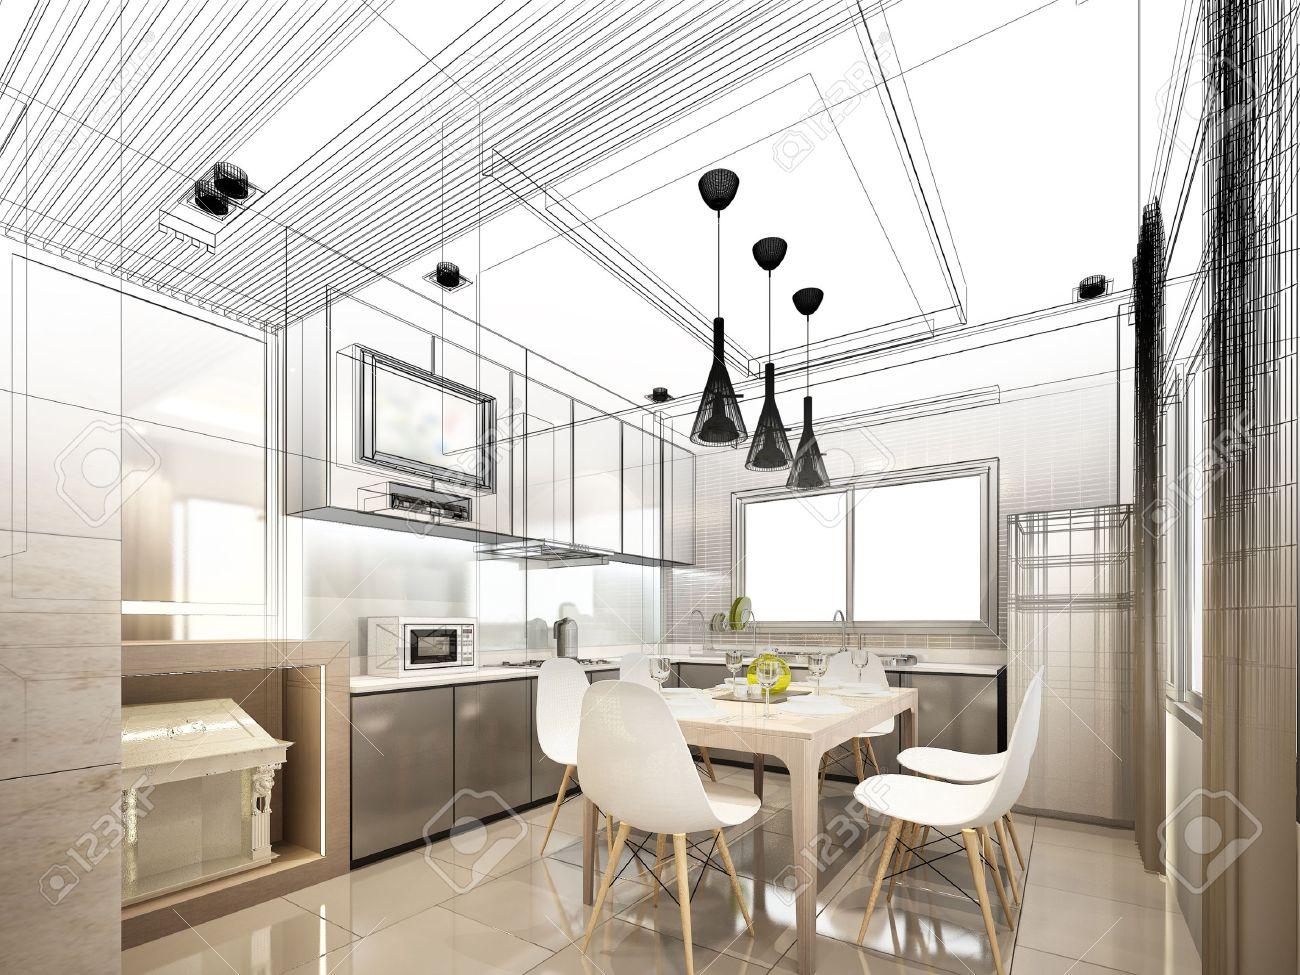 abstract sketch design of interior kitchen - 40904600